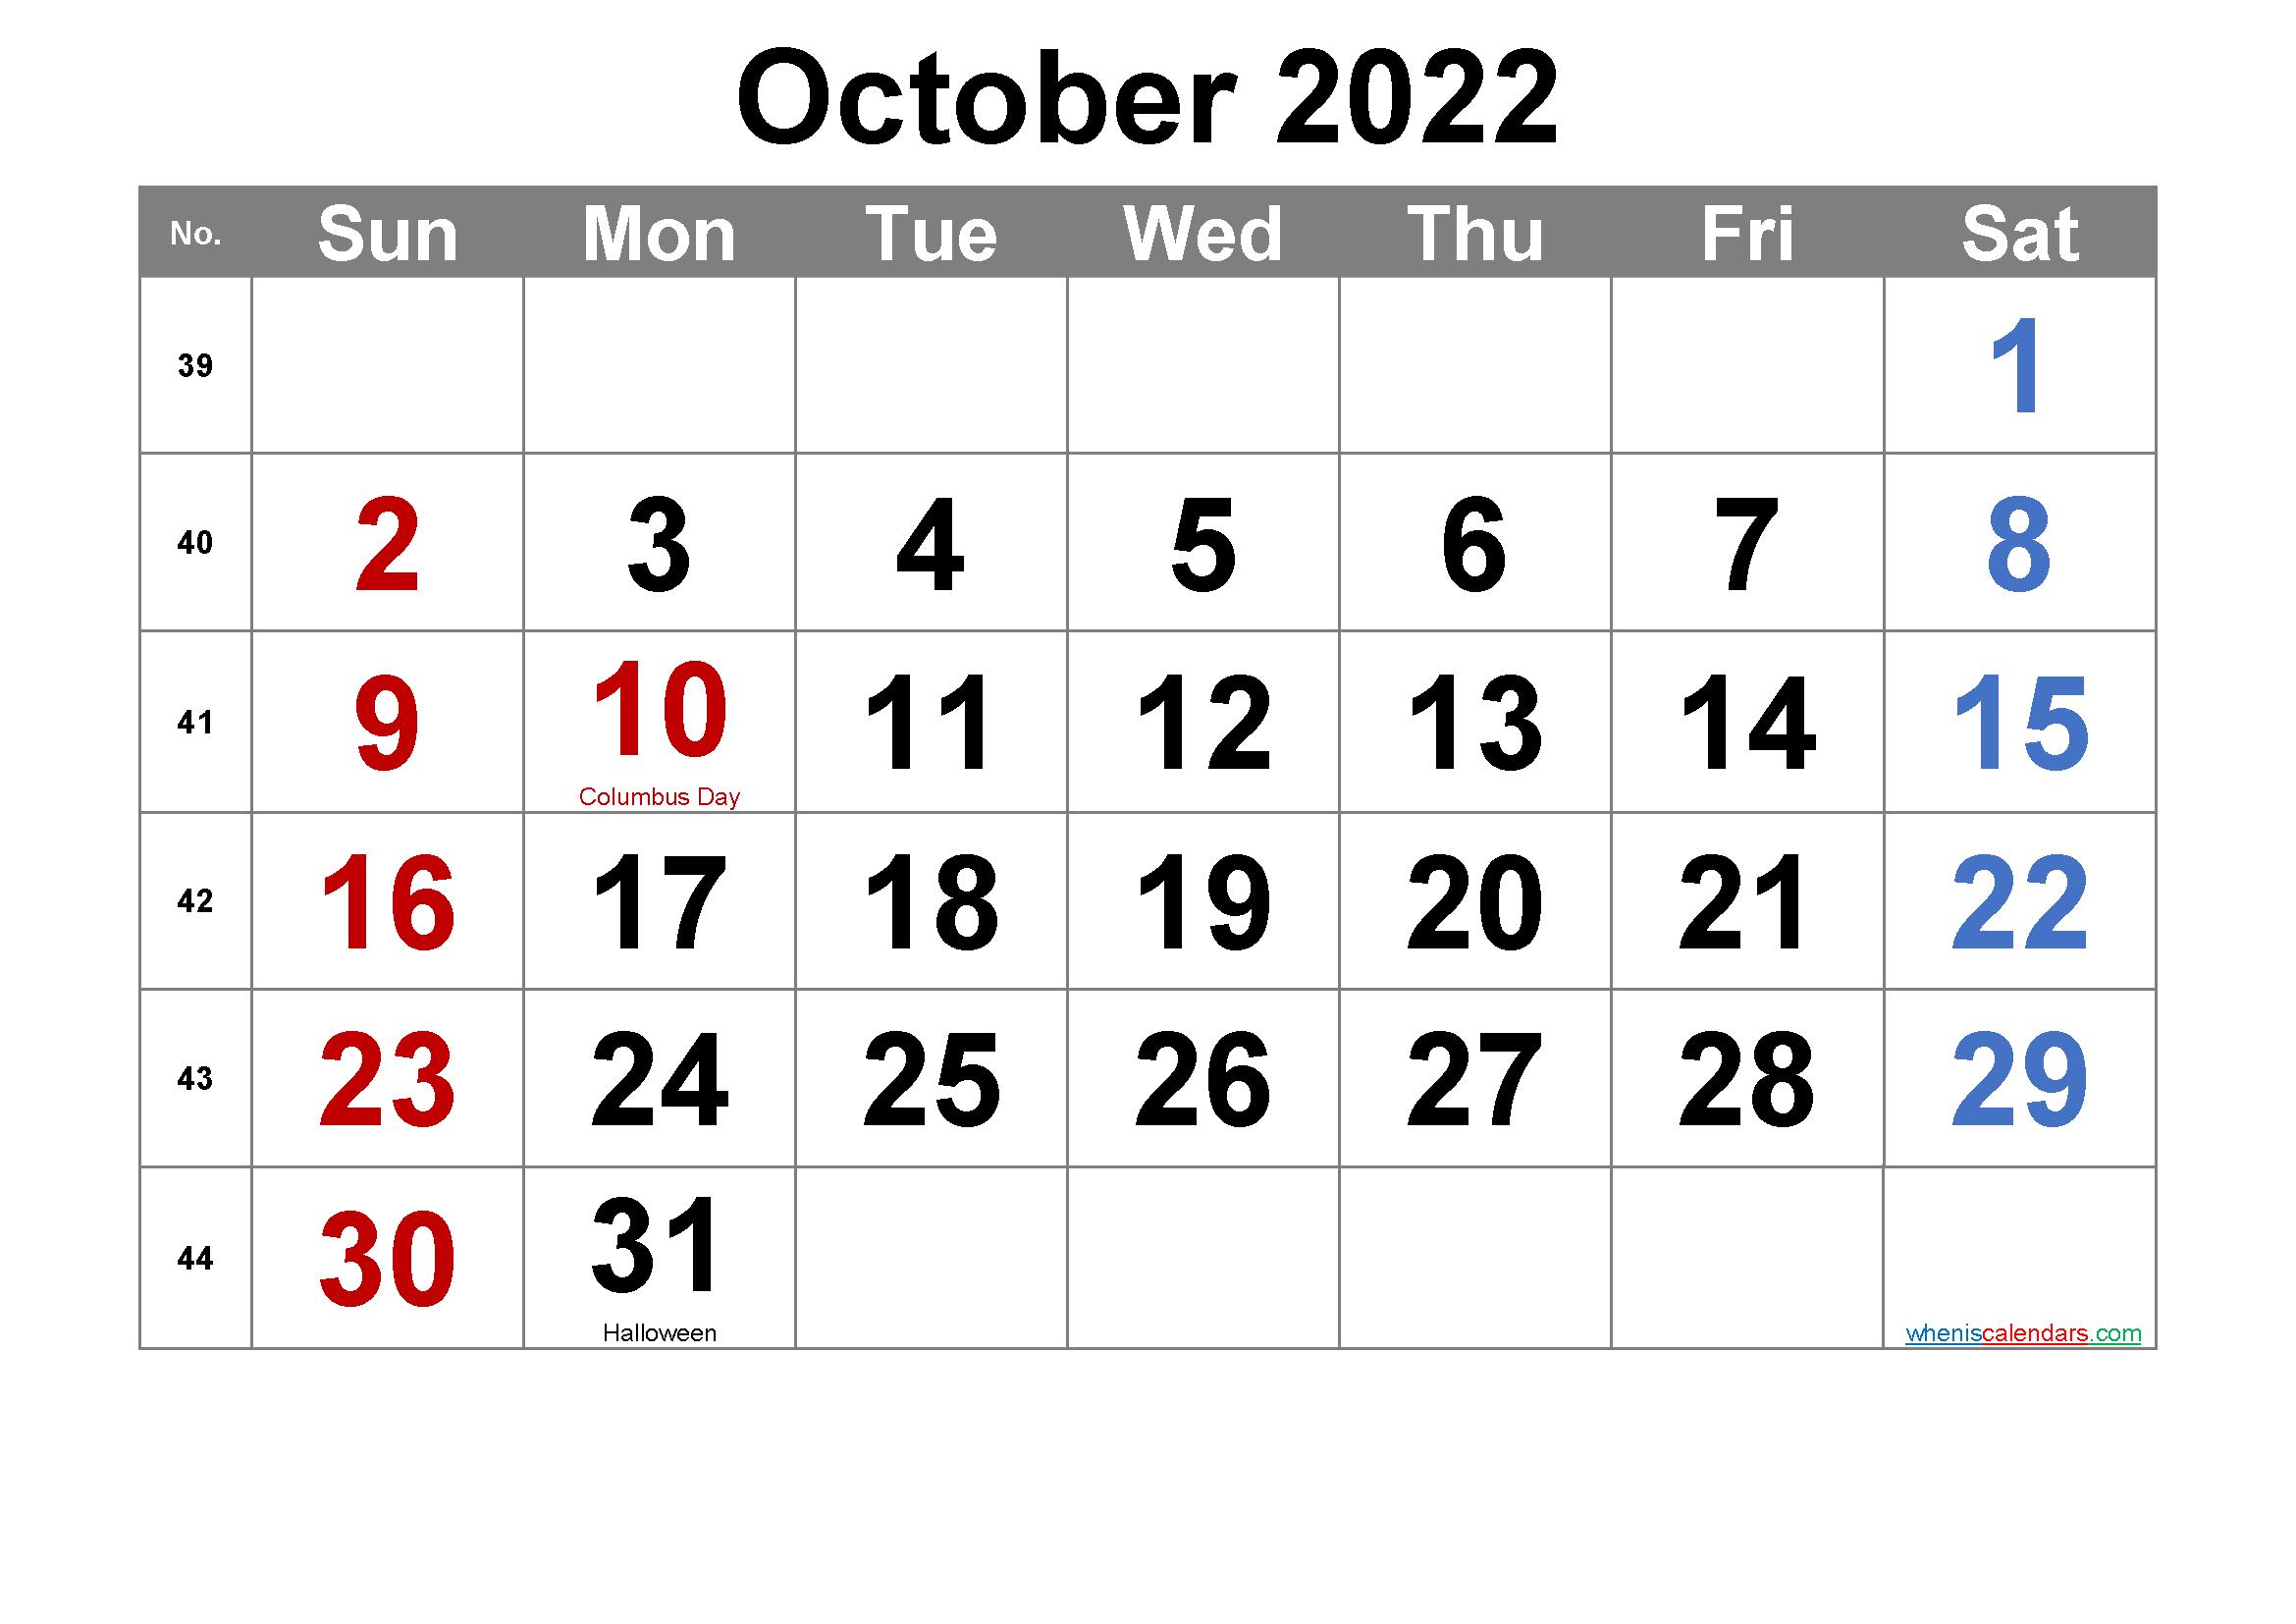 Editable October 2022 Calendar with Holidays